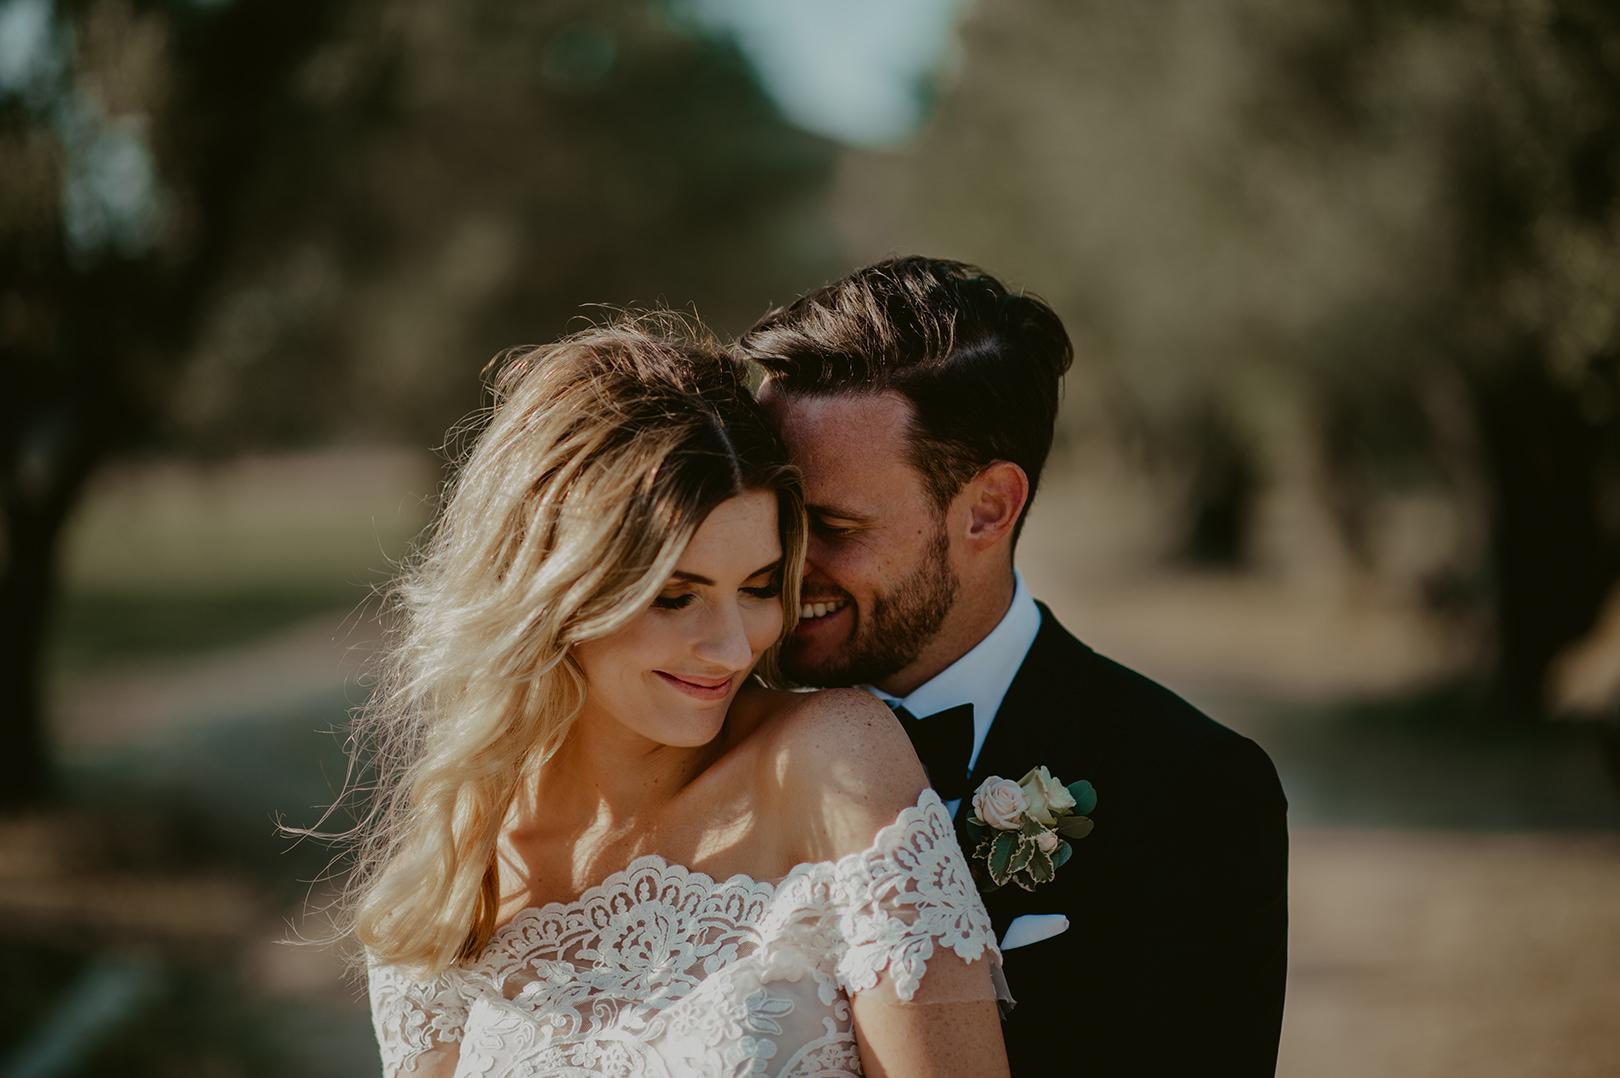 Happy wedding portraiture in Girona Spain